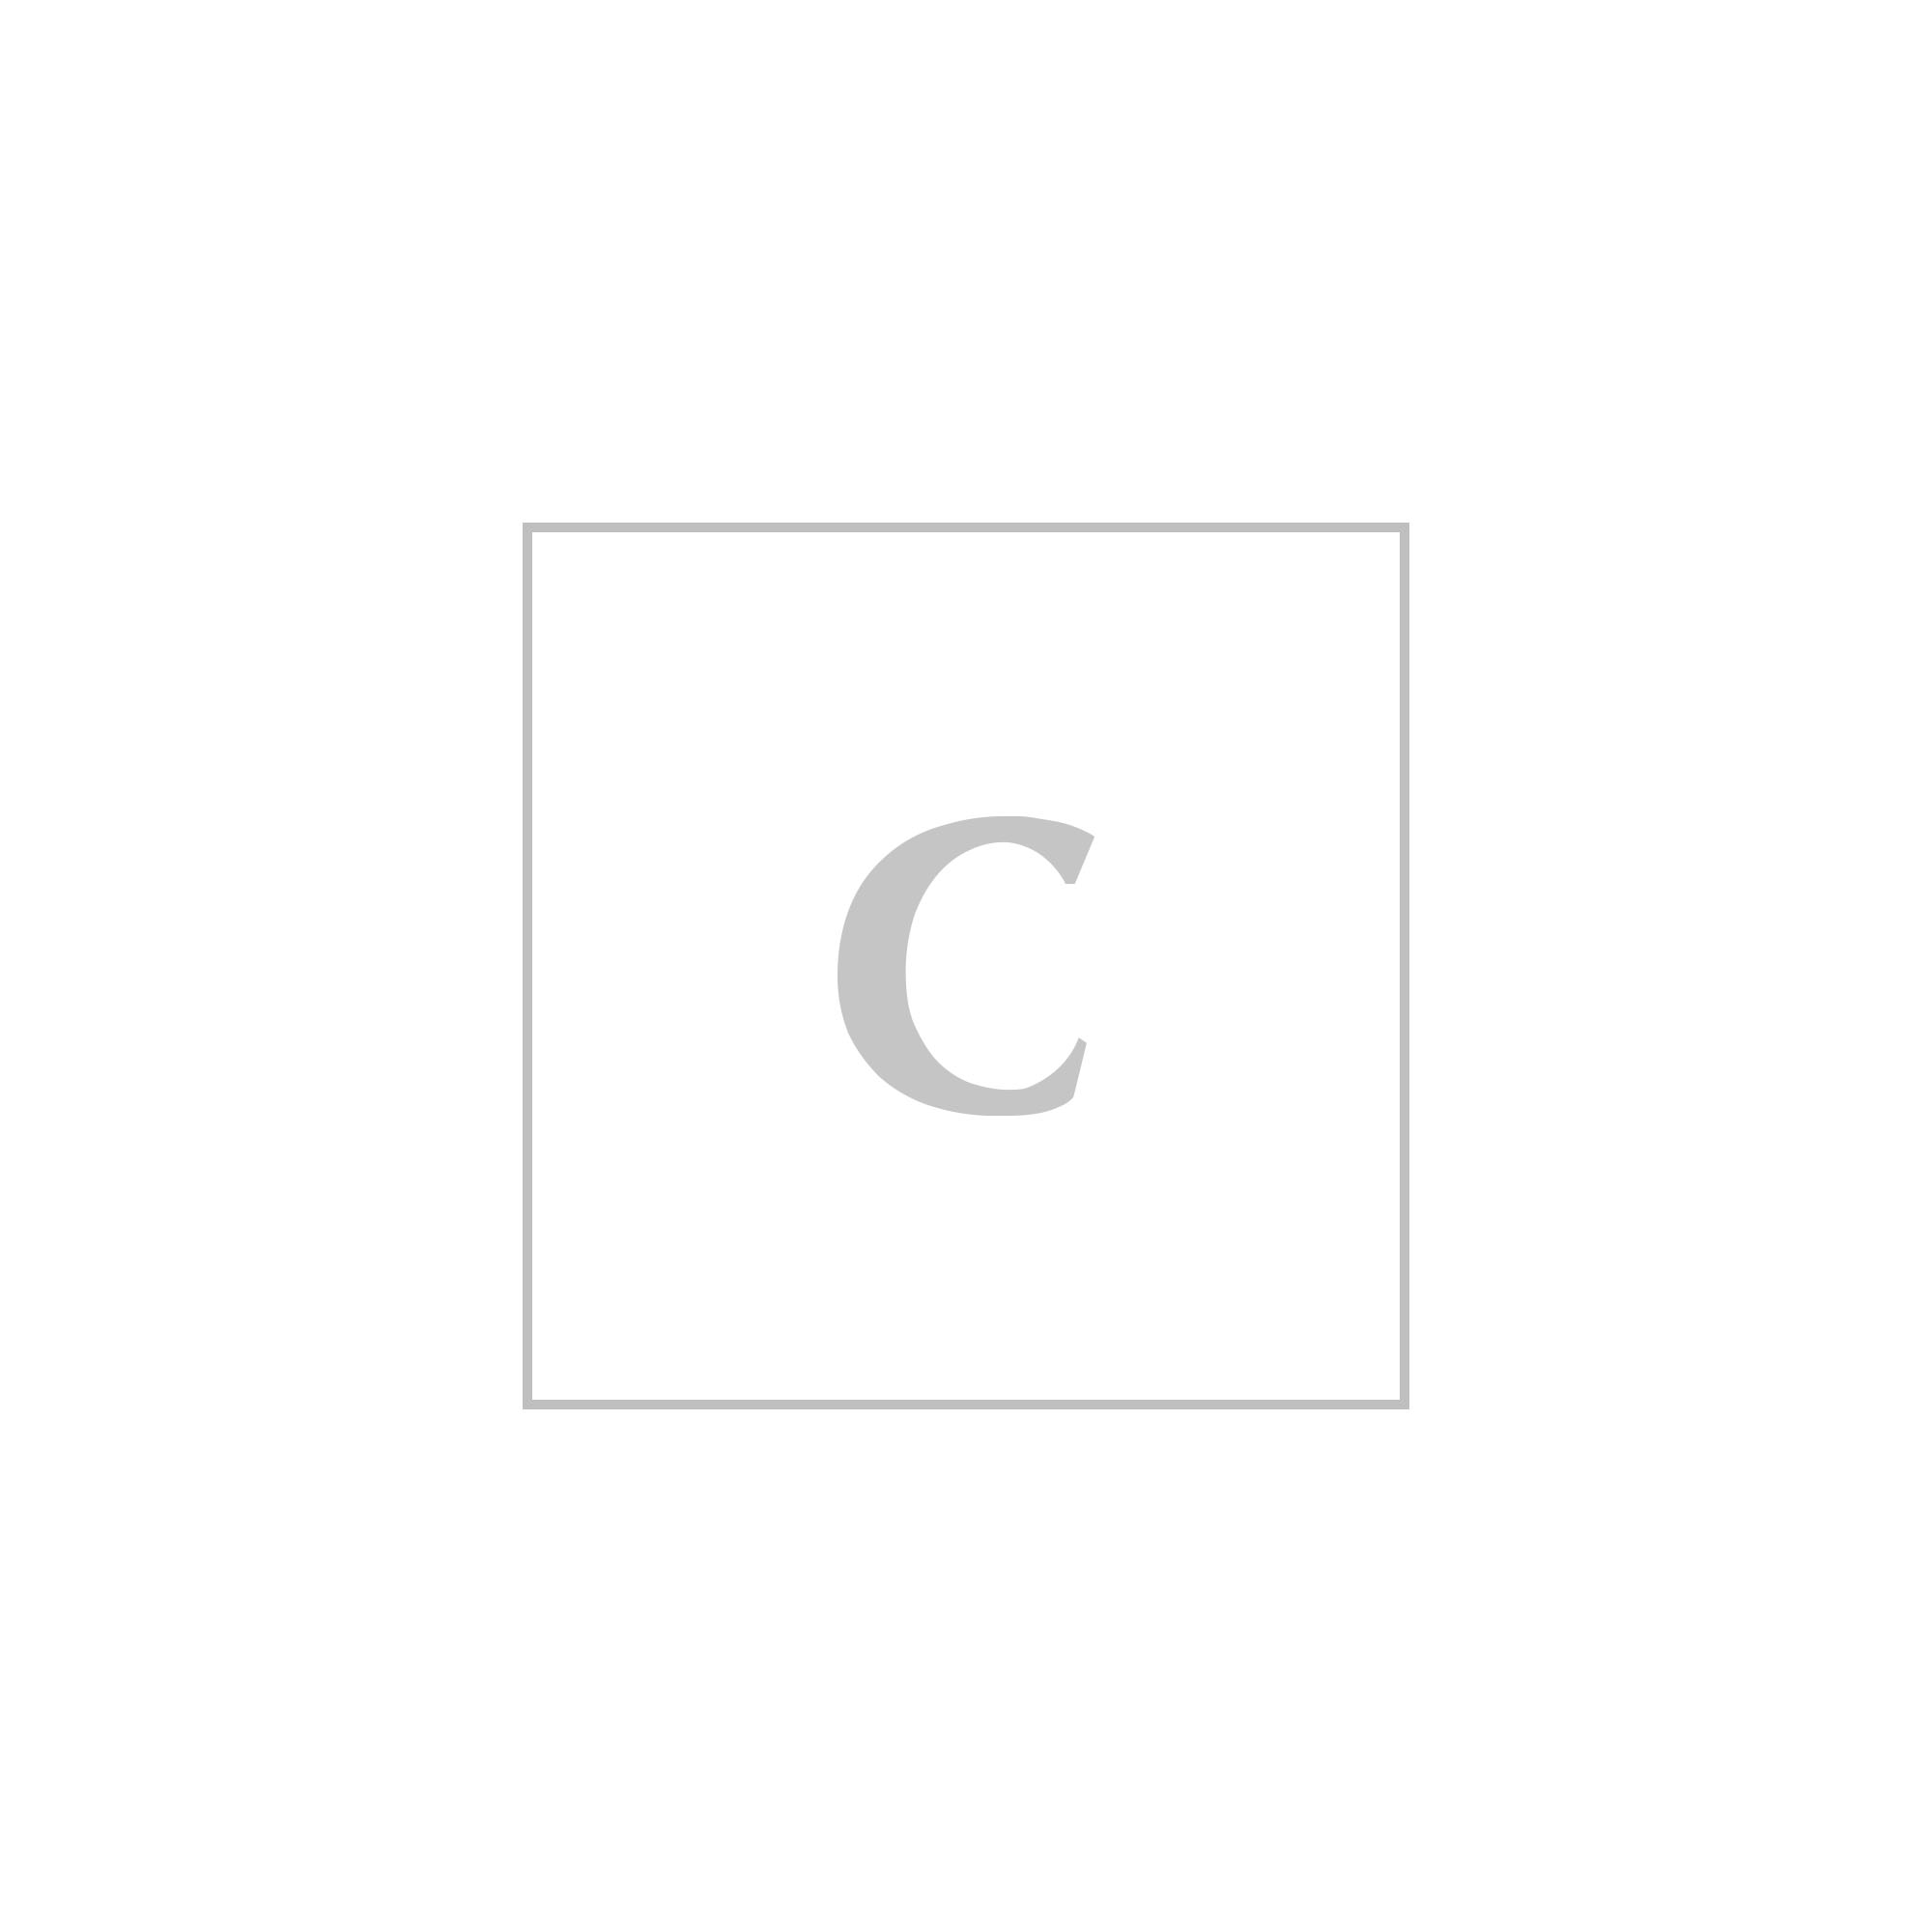 Lardini wooster giacca bicolore